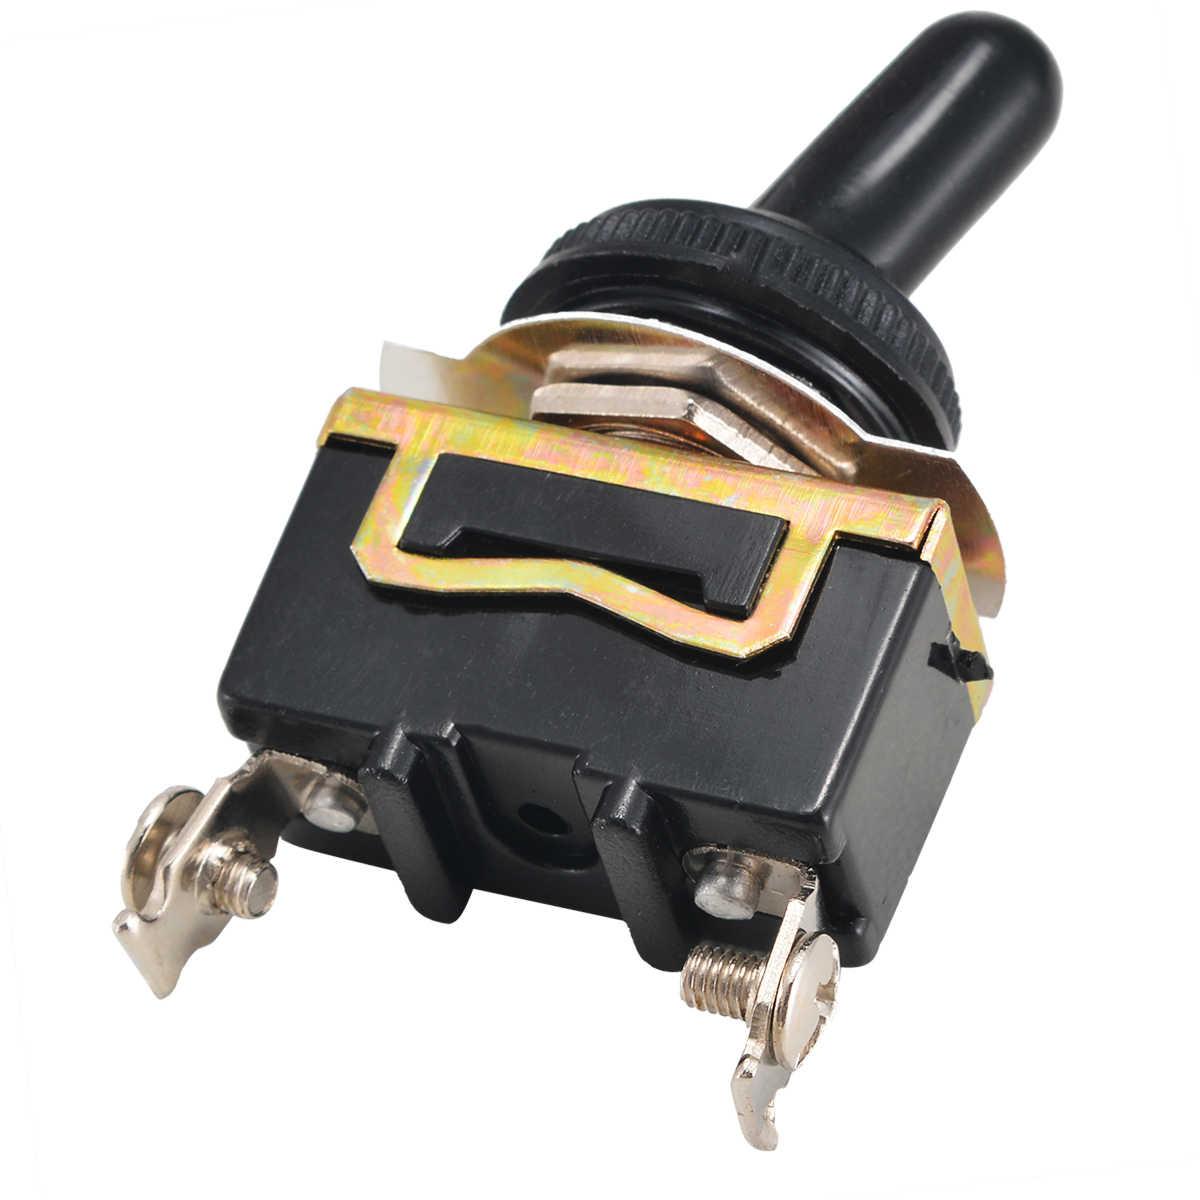 5 adet ağır dayanıklı geçiş anahtarı Mayitr kesen 2 Pin ON OFF Rocker SPST anahtarı su geçirmez çizme SPST anahtarı 15A 250V